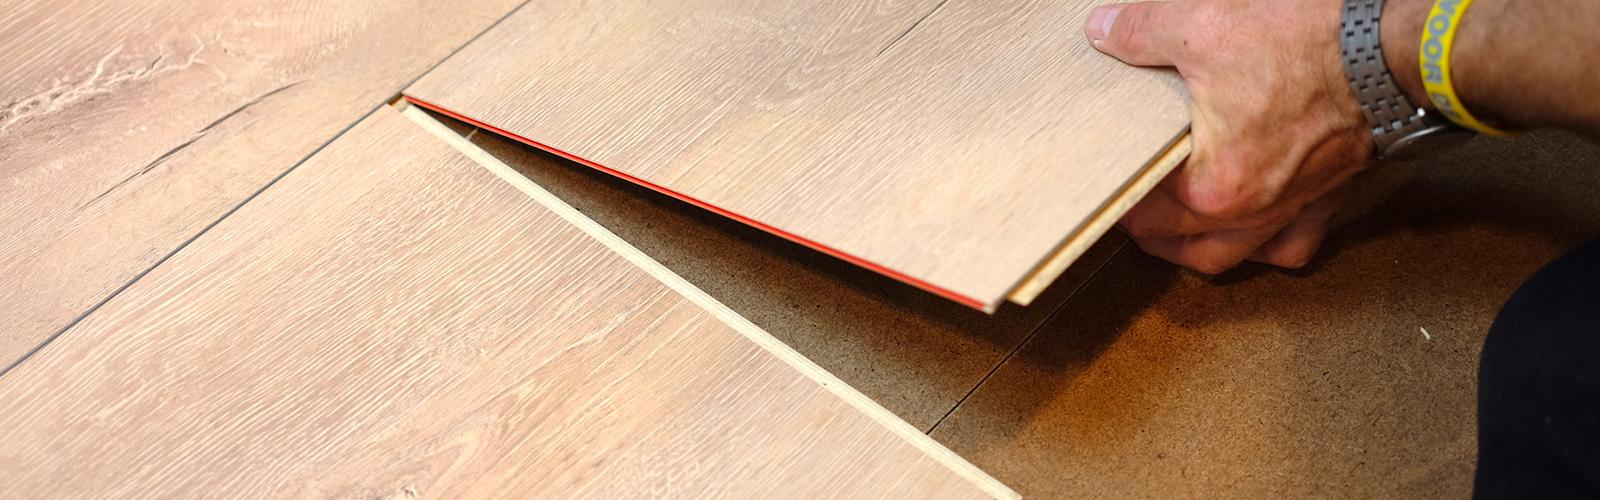 Vloer leggen, vloer montage, laminaat leggen en legservice. Alles in eigen huis